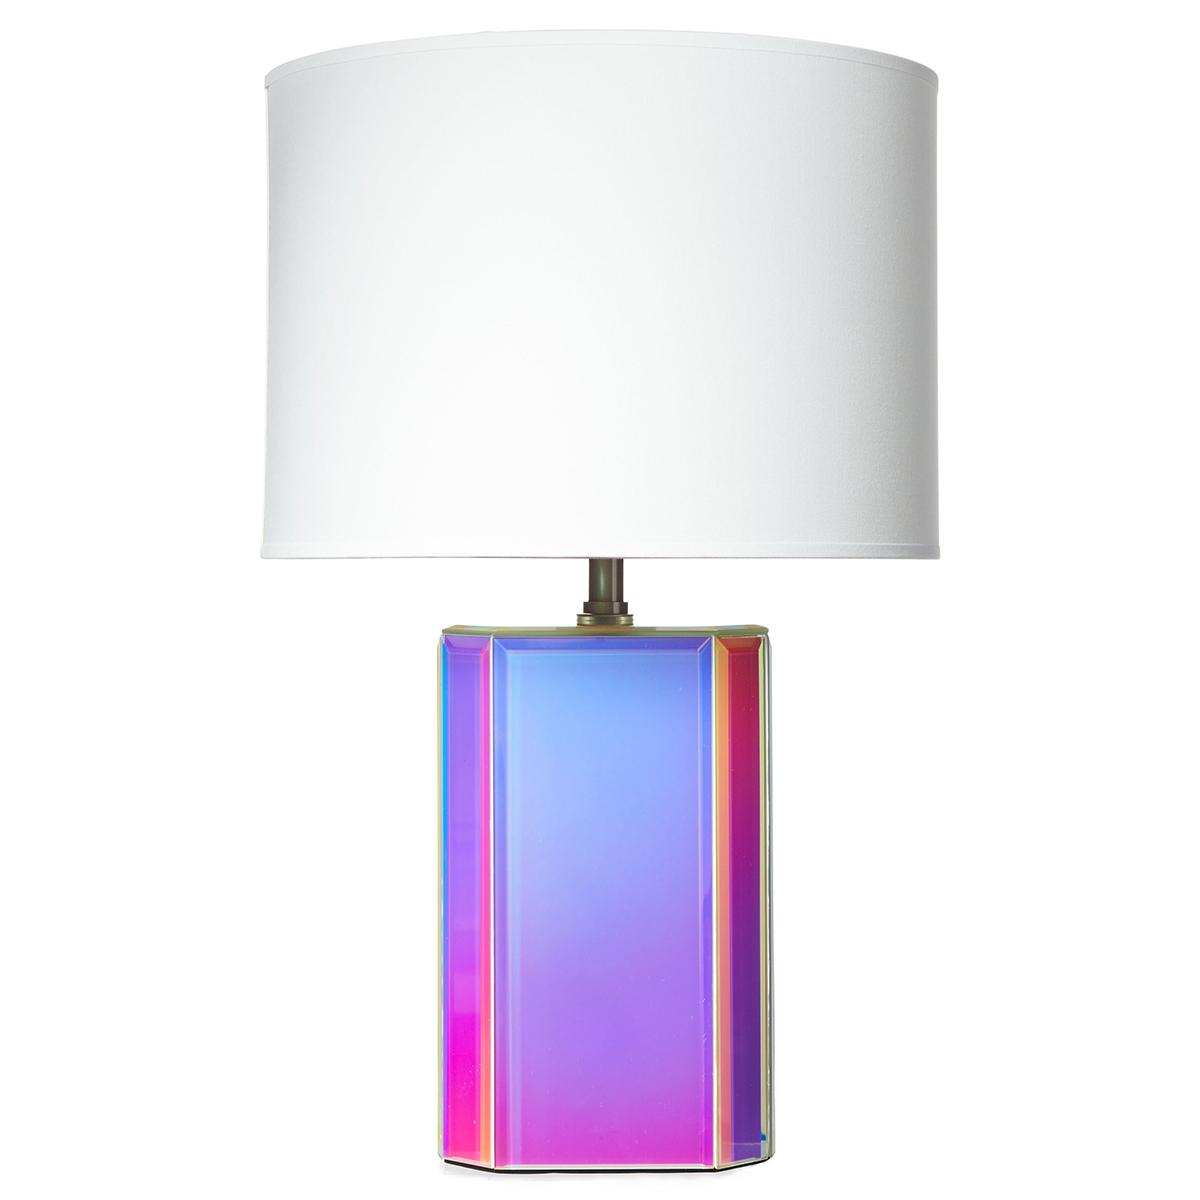 Pottery Barn Teen Iridescent Table Lamp